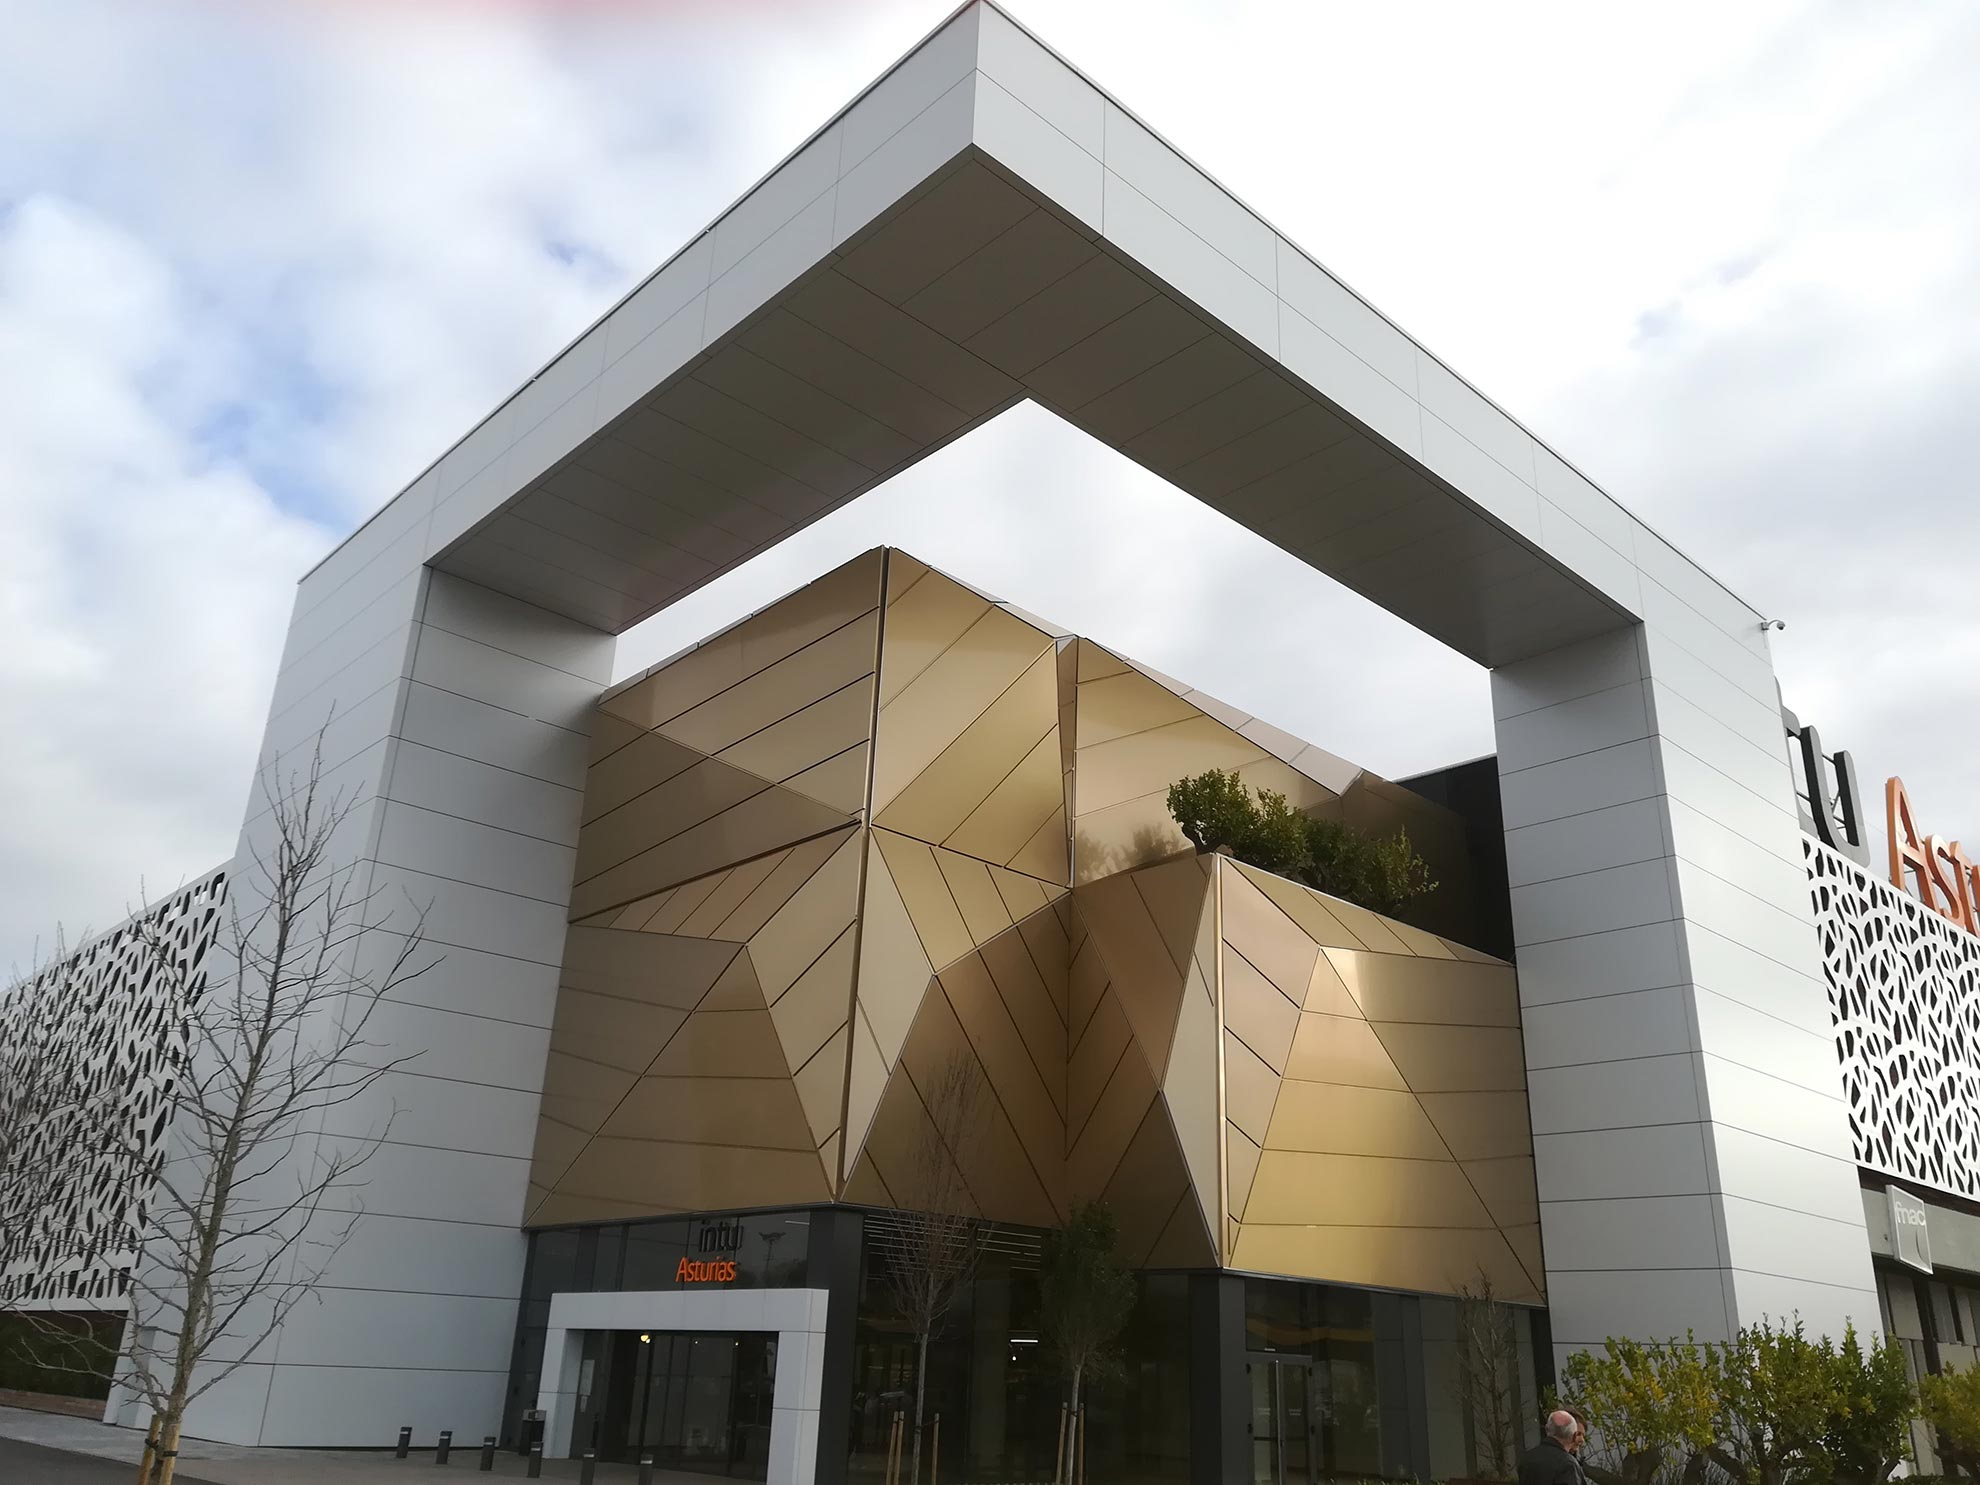 Centro-comercial-Intu-Asturias-Lugones-Spain_01_1591718419.jpg